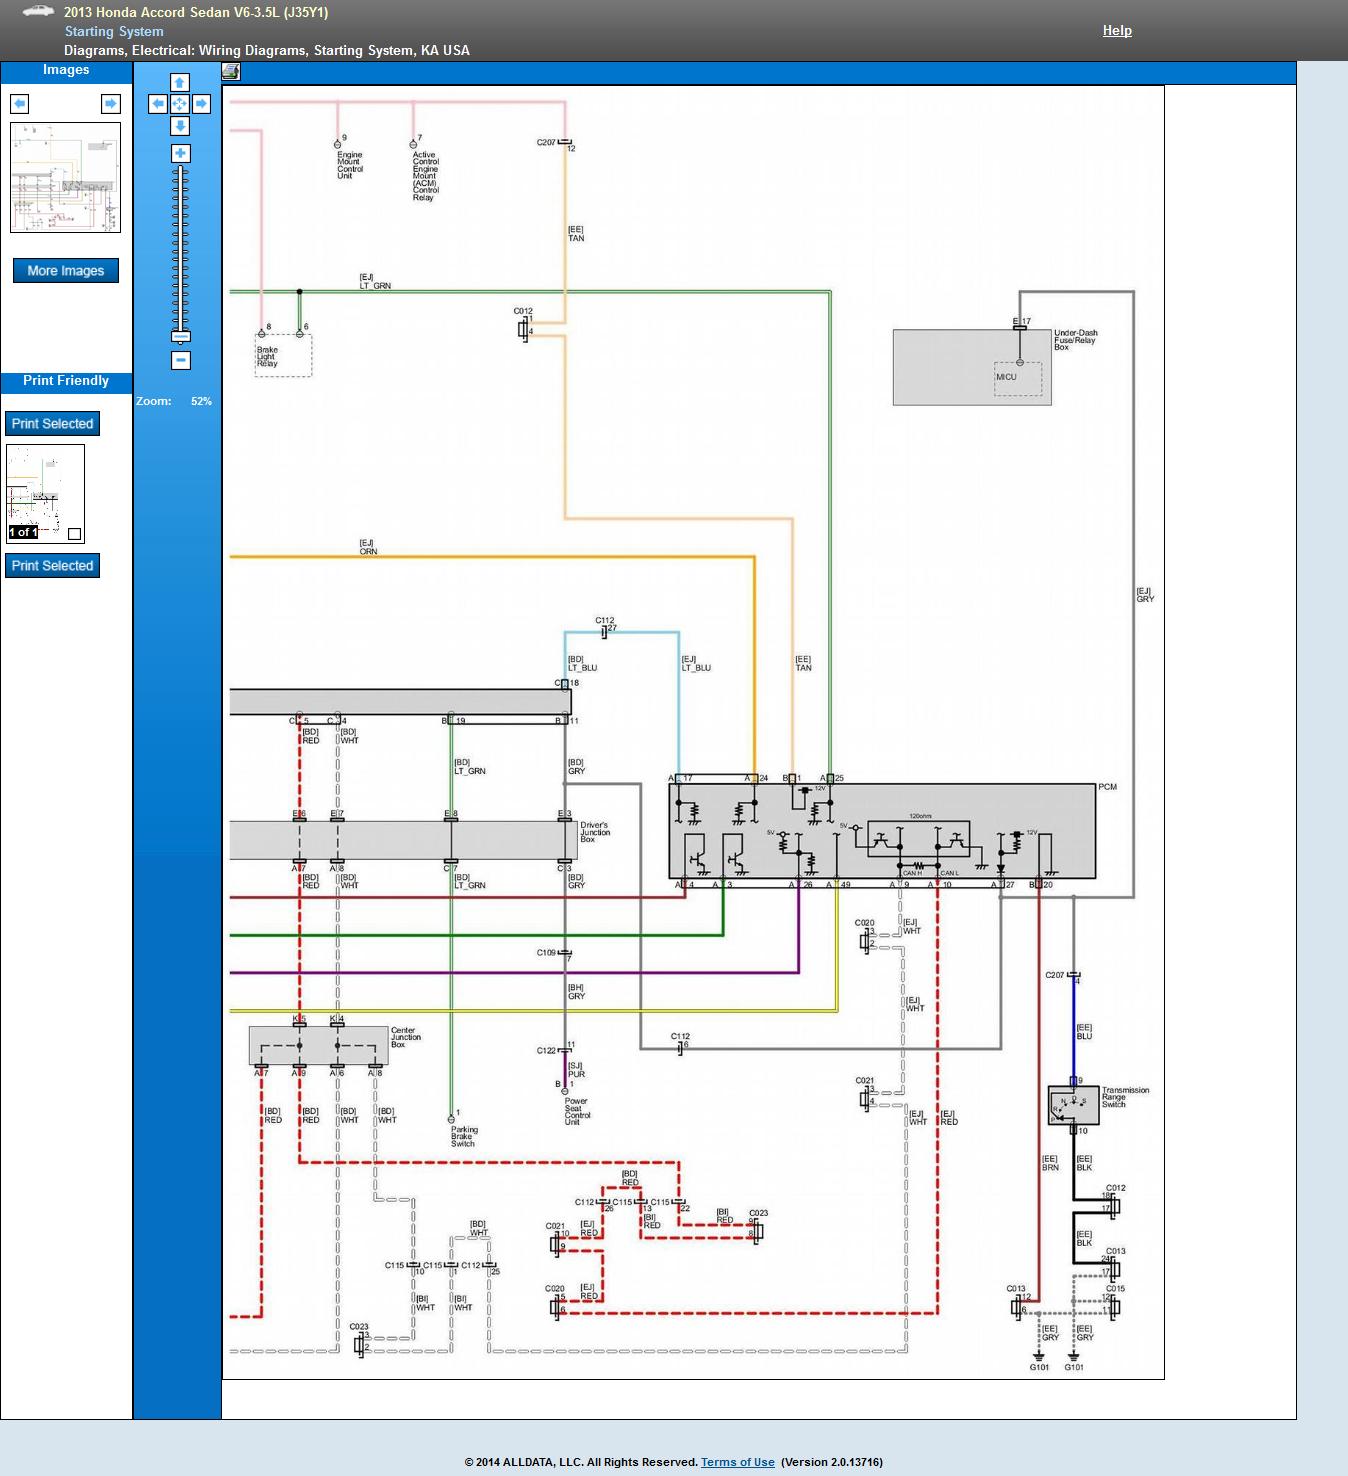 2013 Honda Accord Wiring Diagram Manual Of 2014 Radio I Need Push To Start Ciruit Rh Justanswer Com Factory